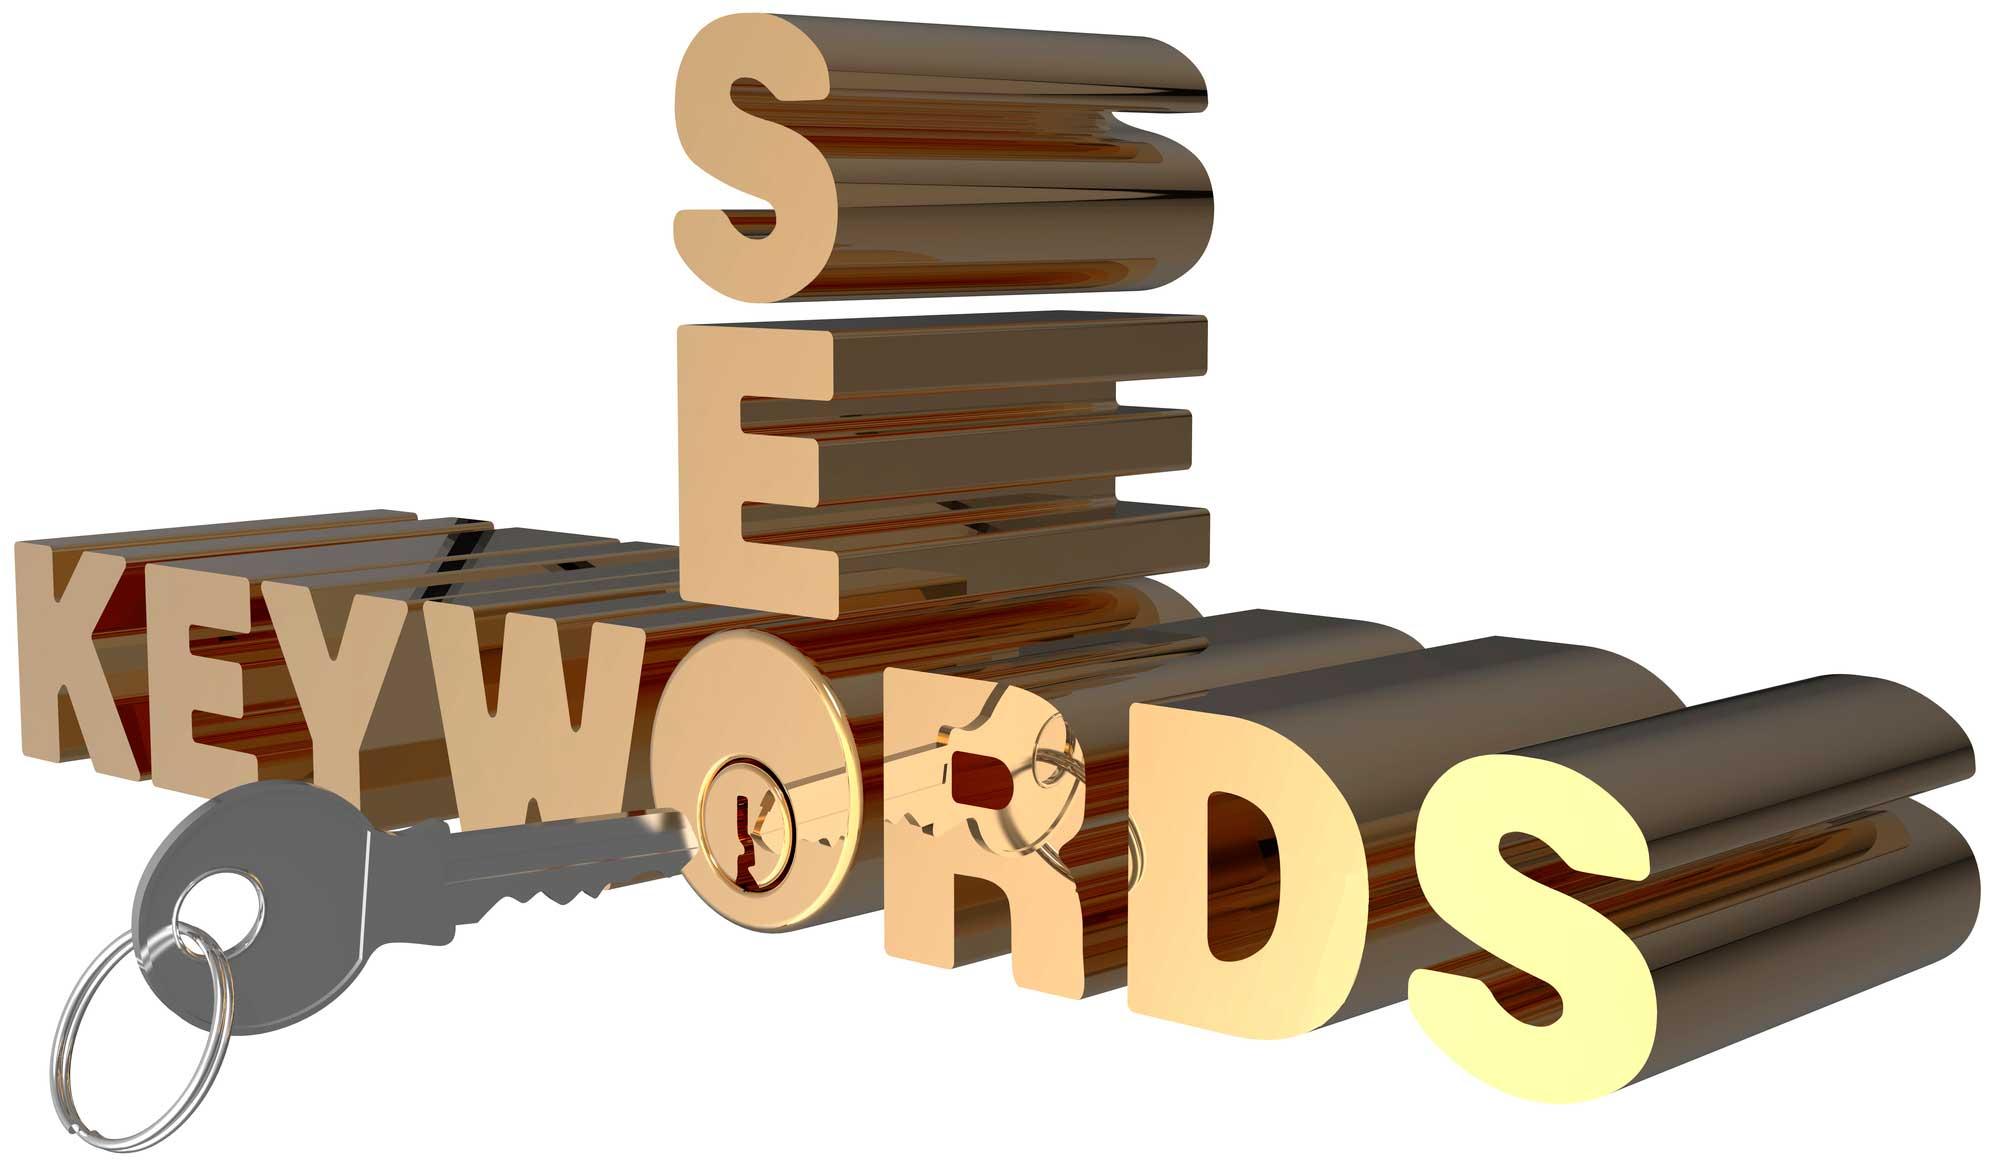 Keyword planning image